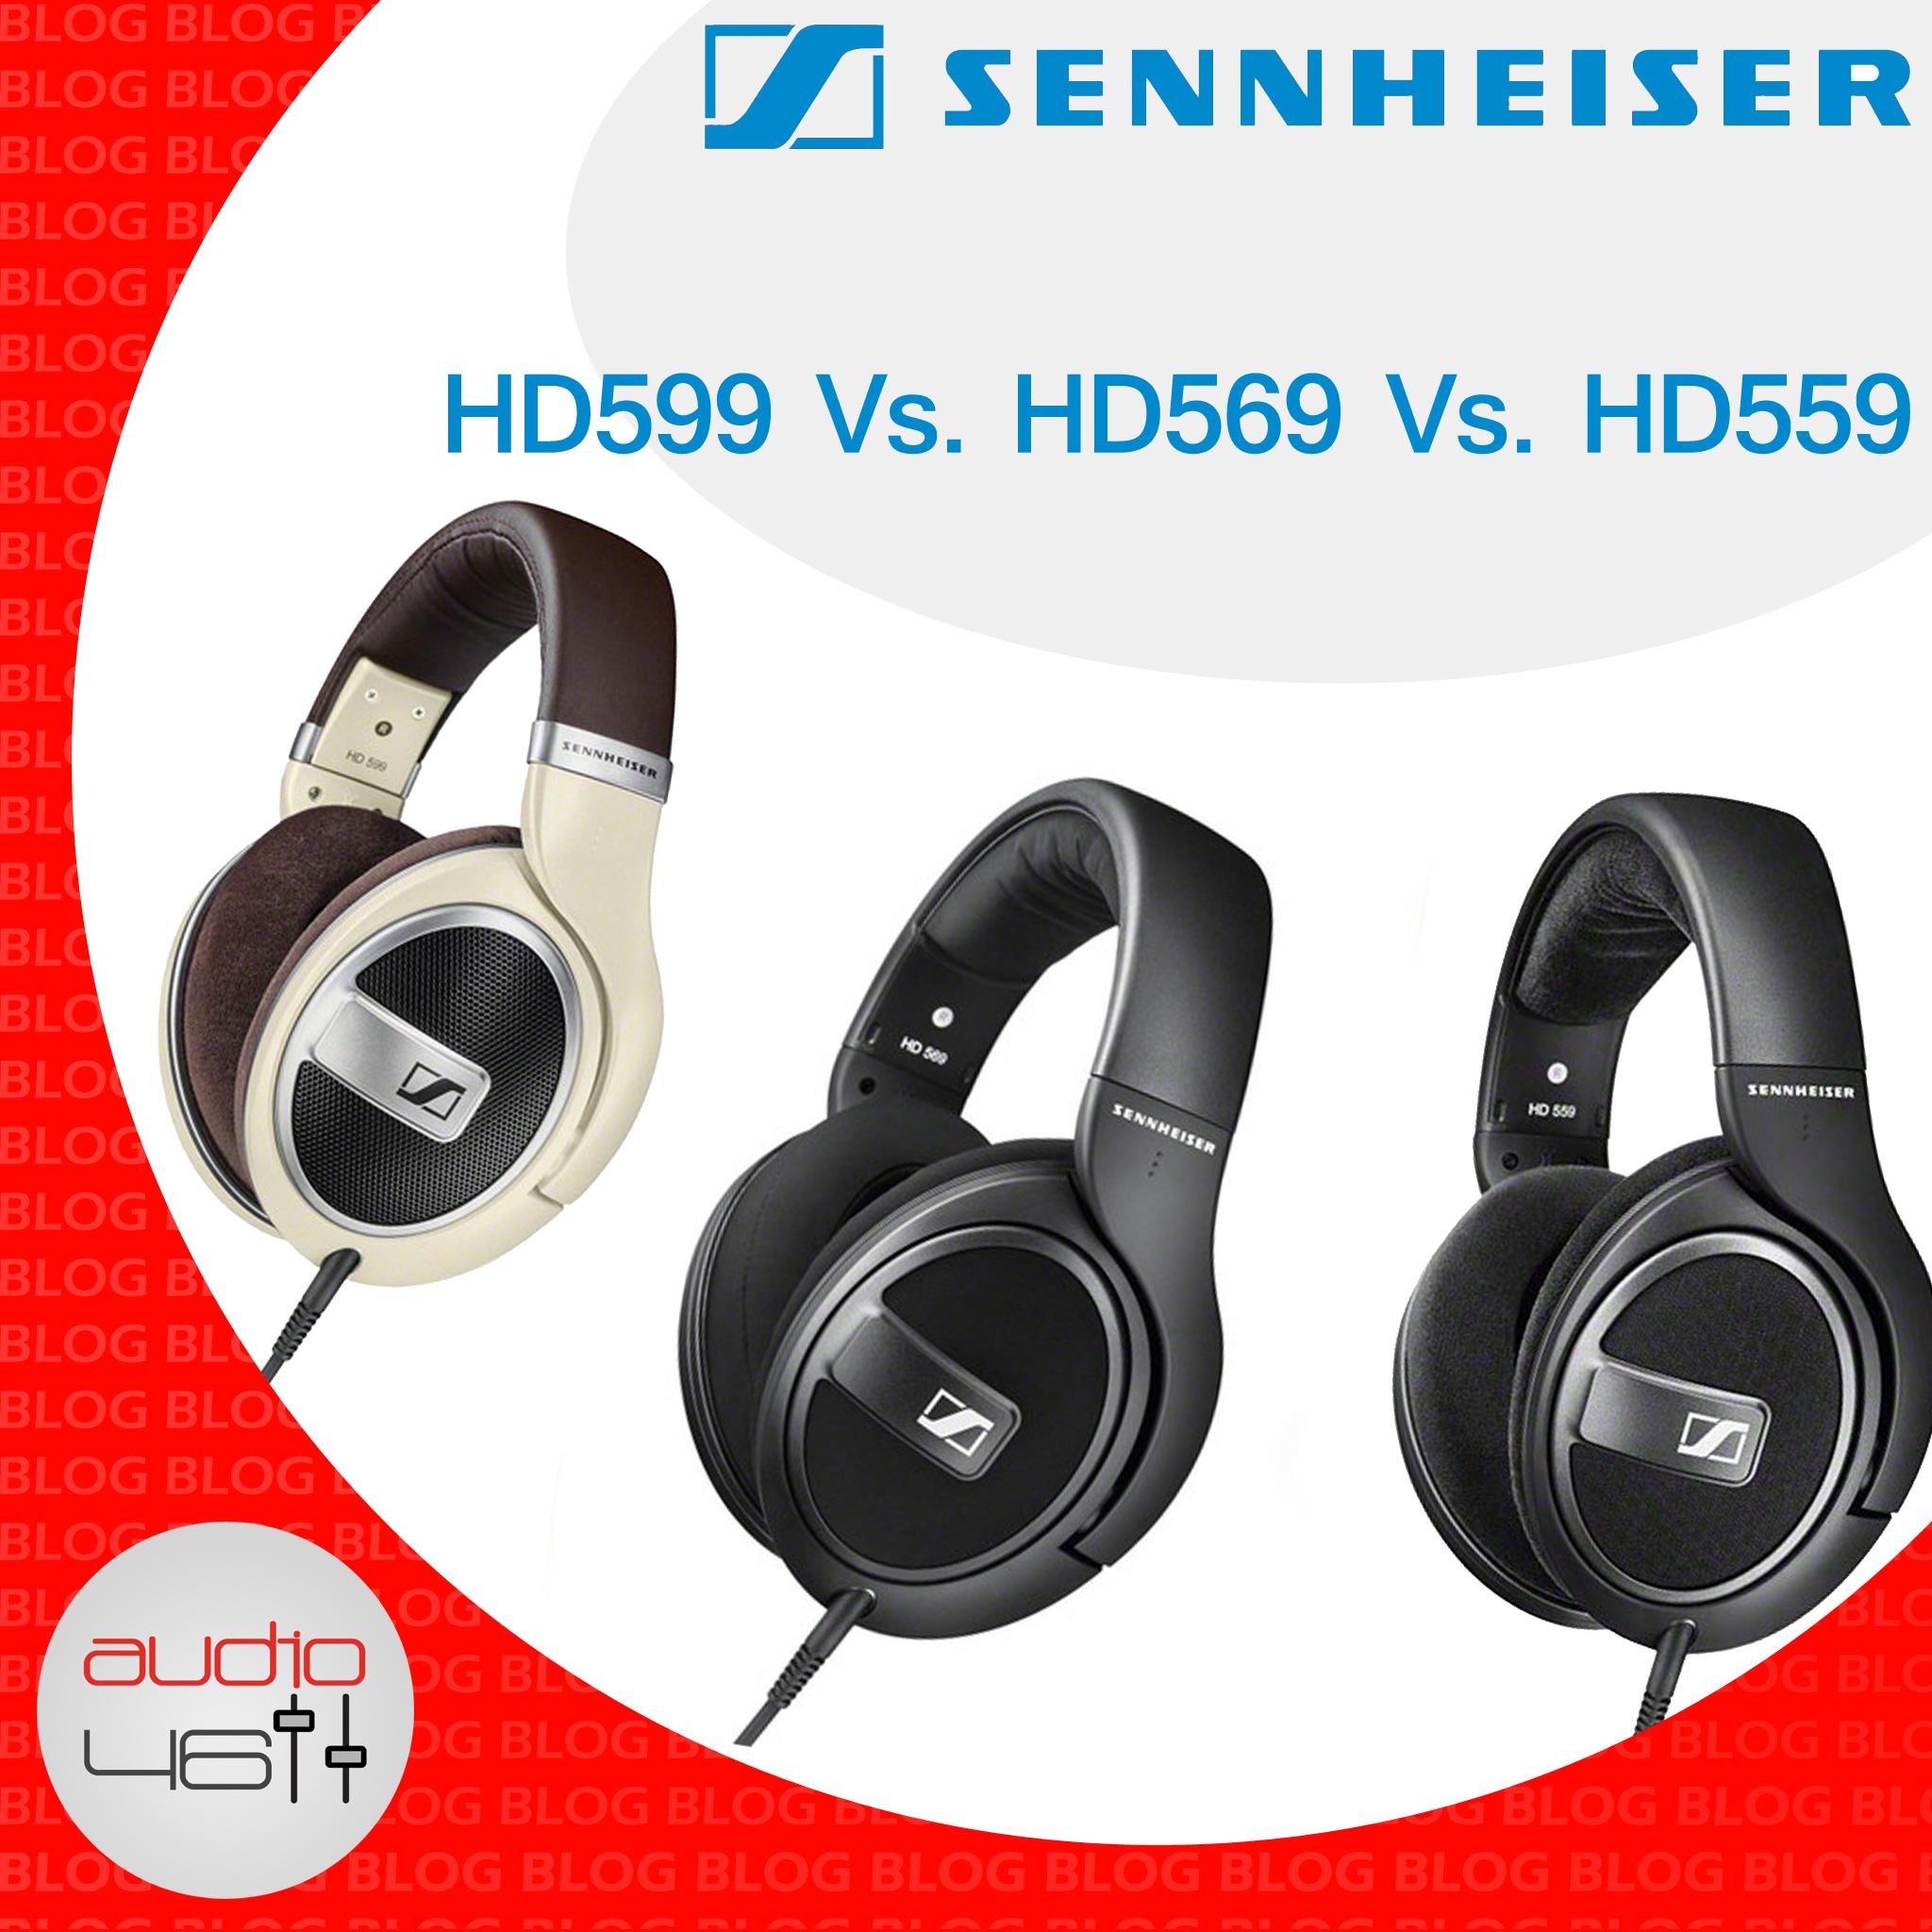 Sennheiser HD 599 vs HD 569 vs HD 559 Comparison Review